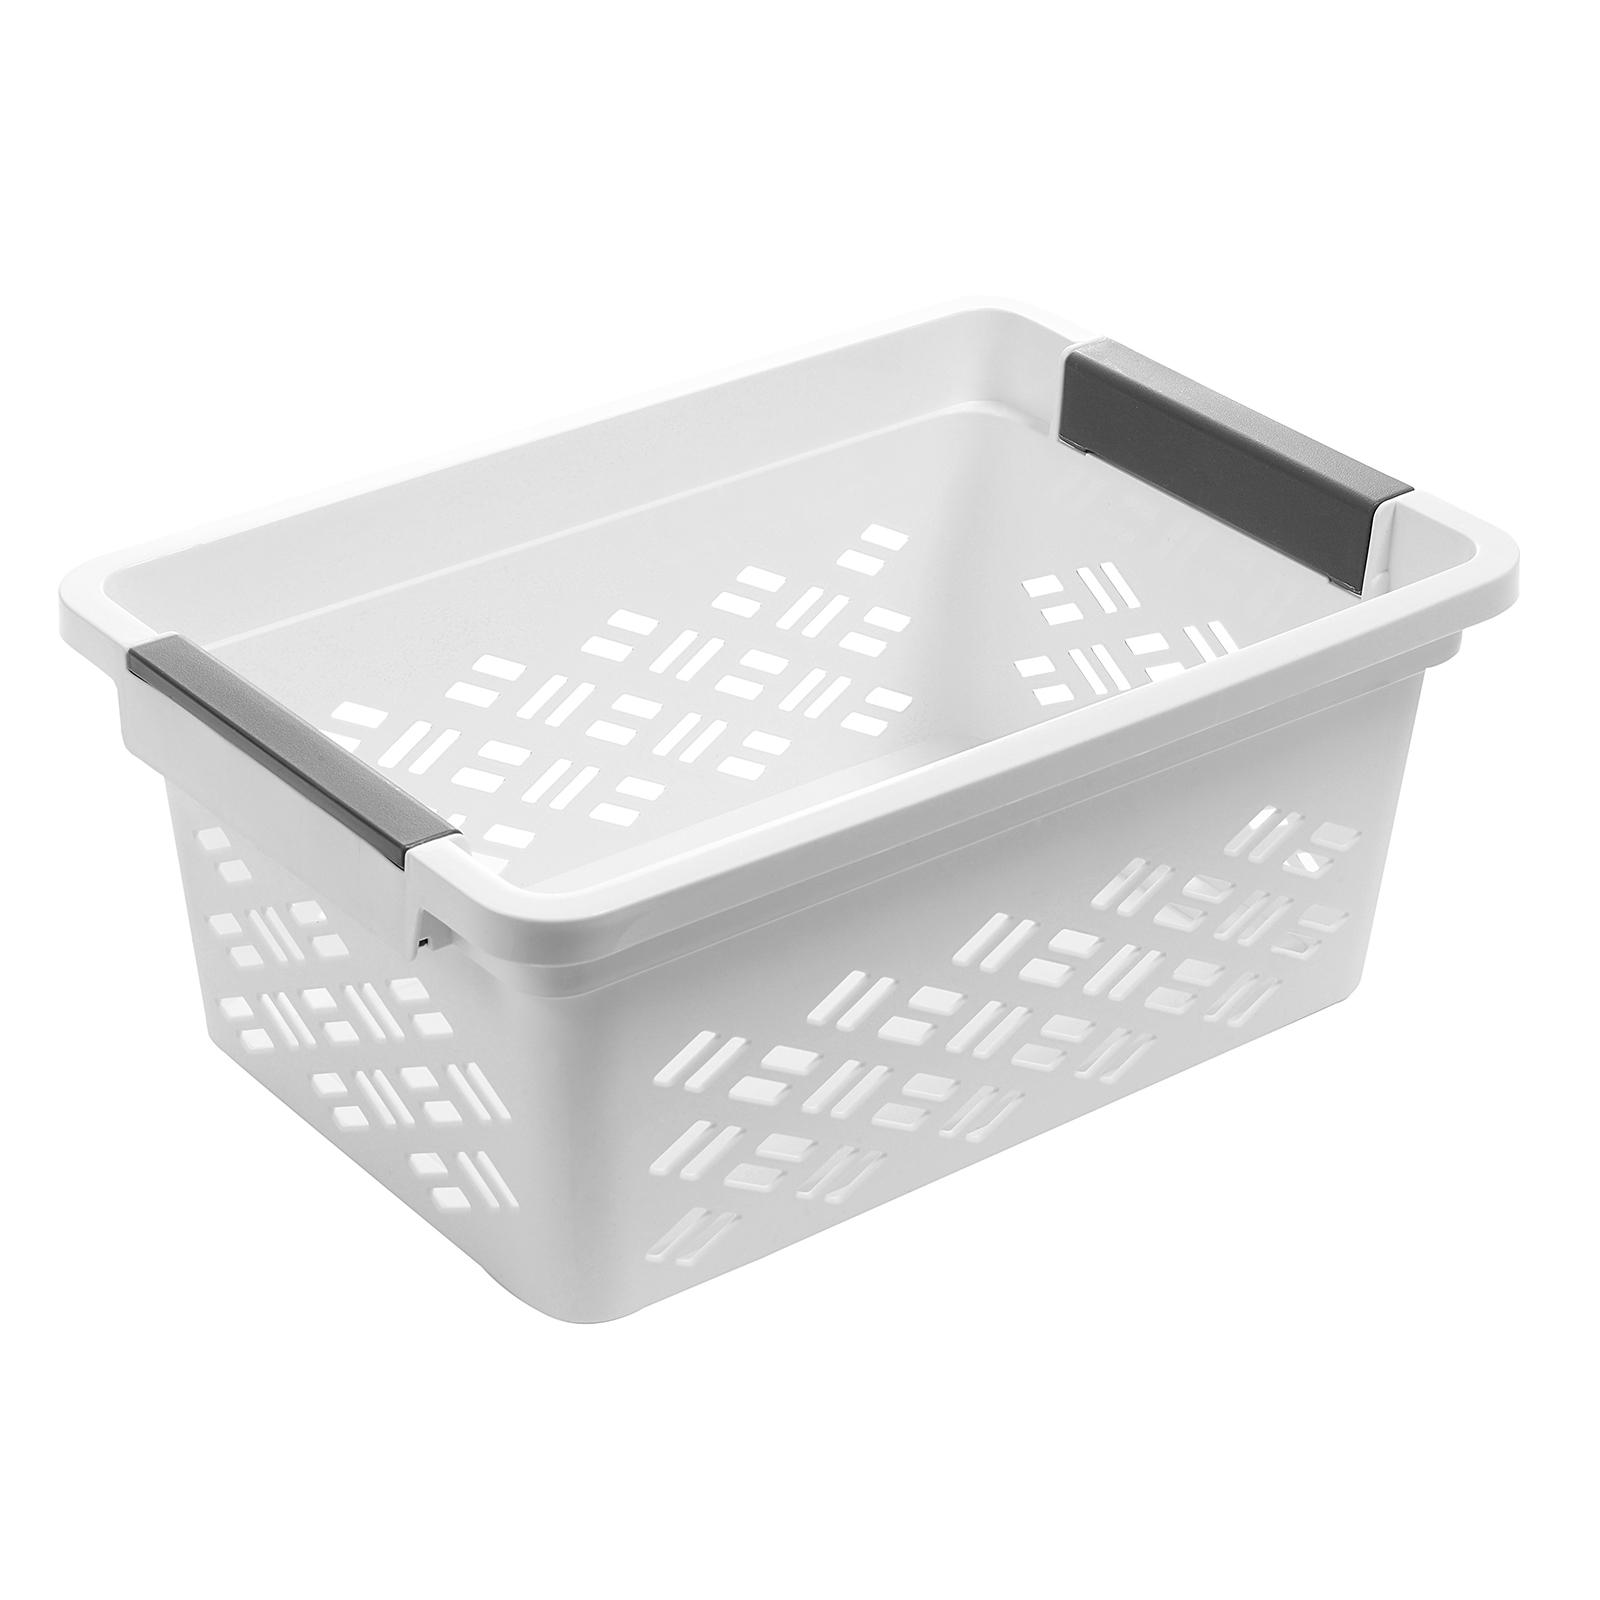 Ezy Storage Small Brickor Stacking Basket